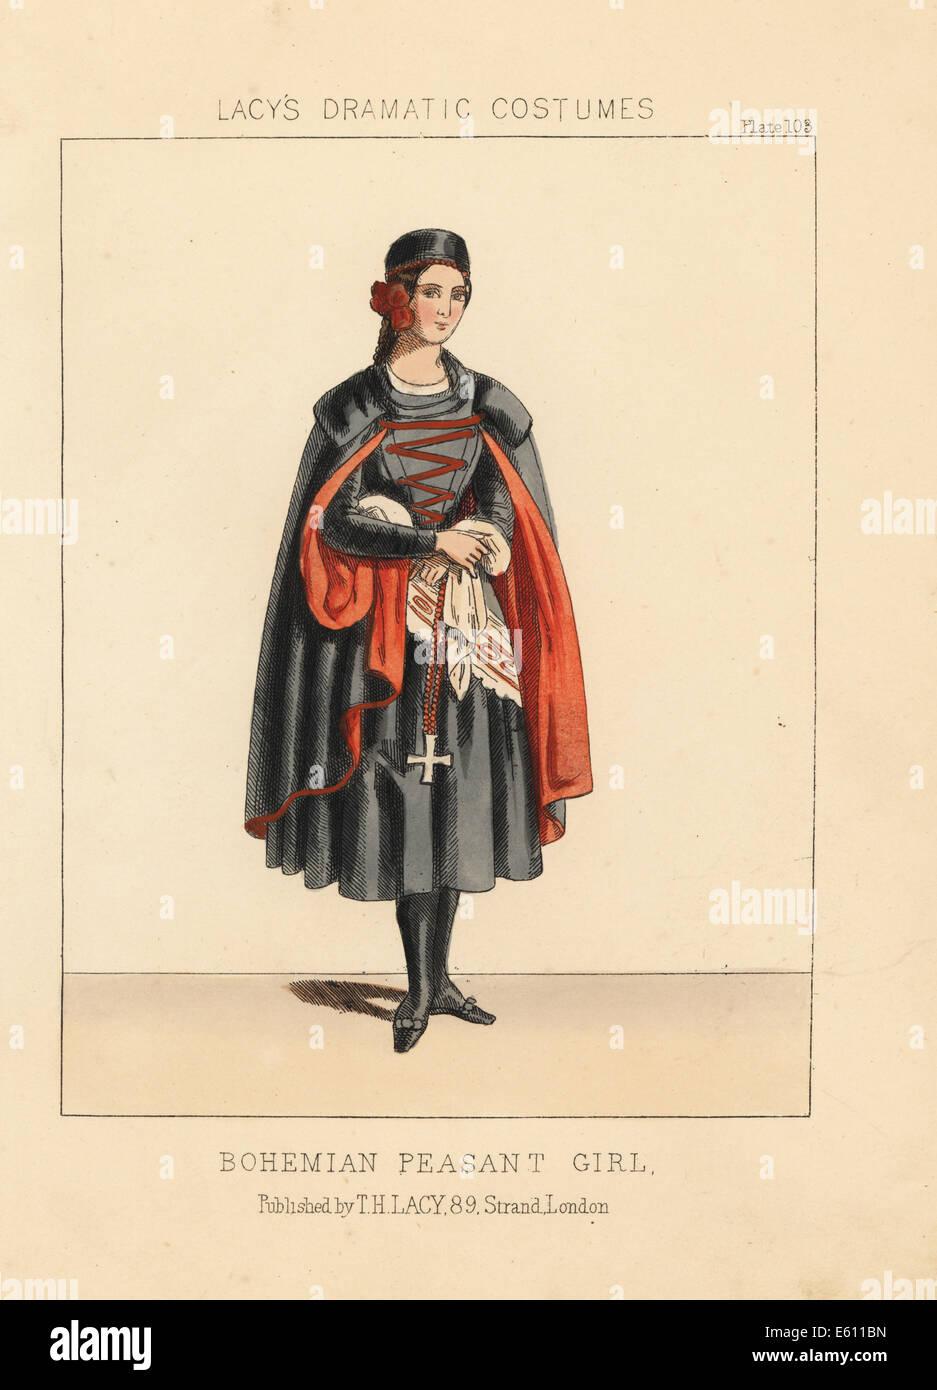 Bohemian peasant girl, 19th century. - Stock Image